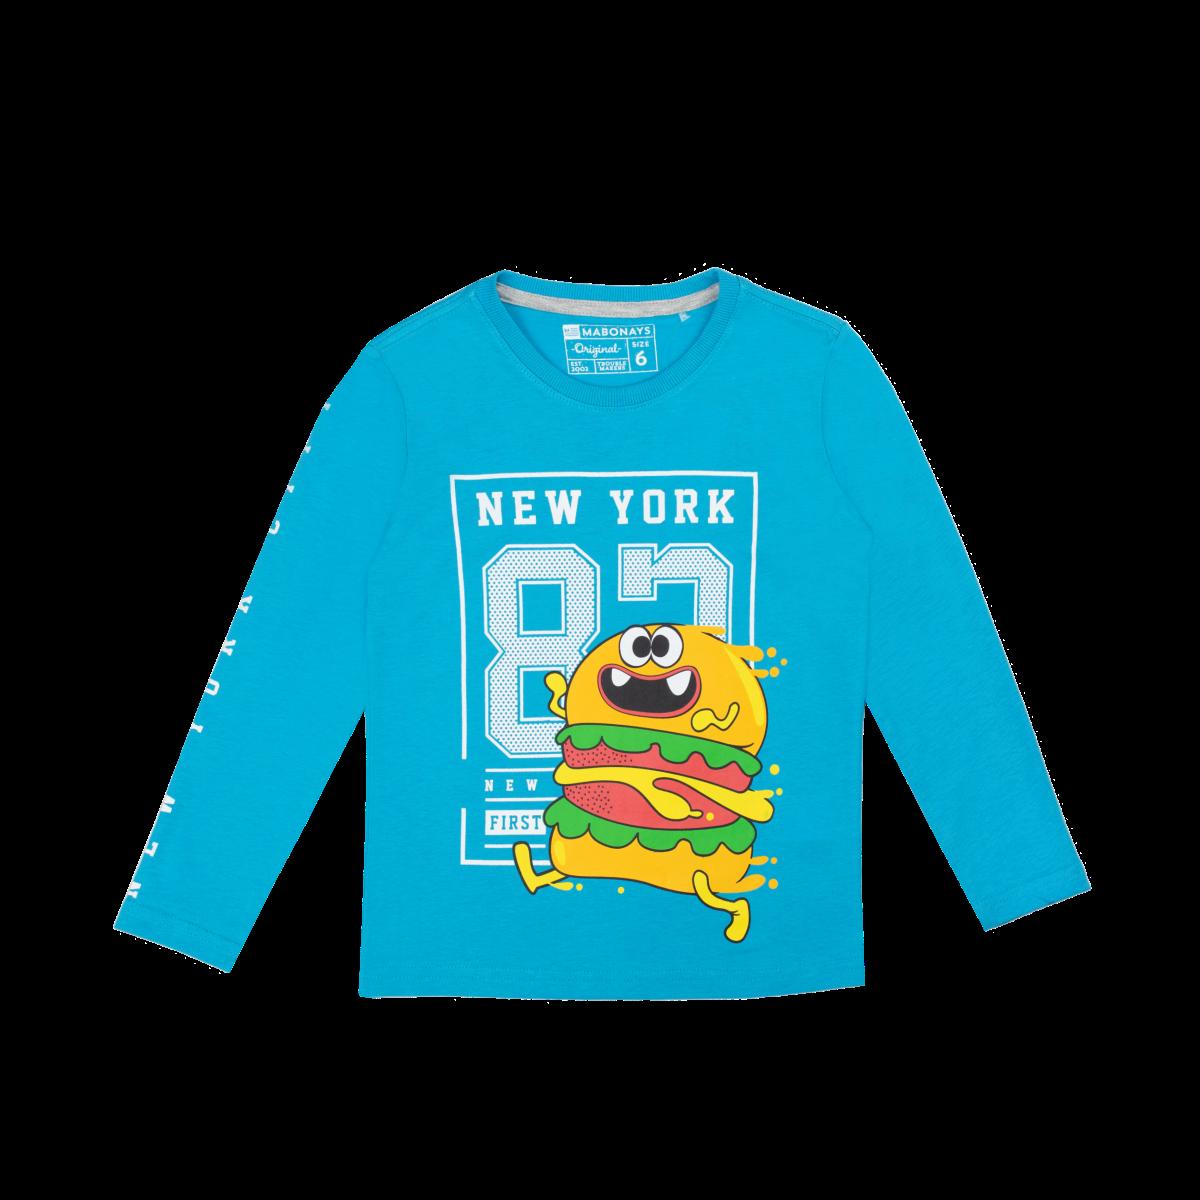 Fantovska majica, svetlo modra